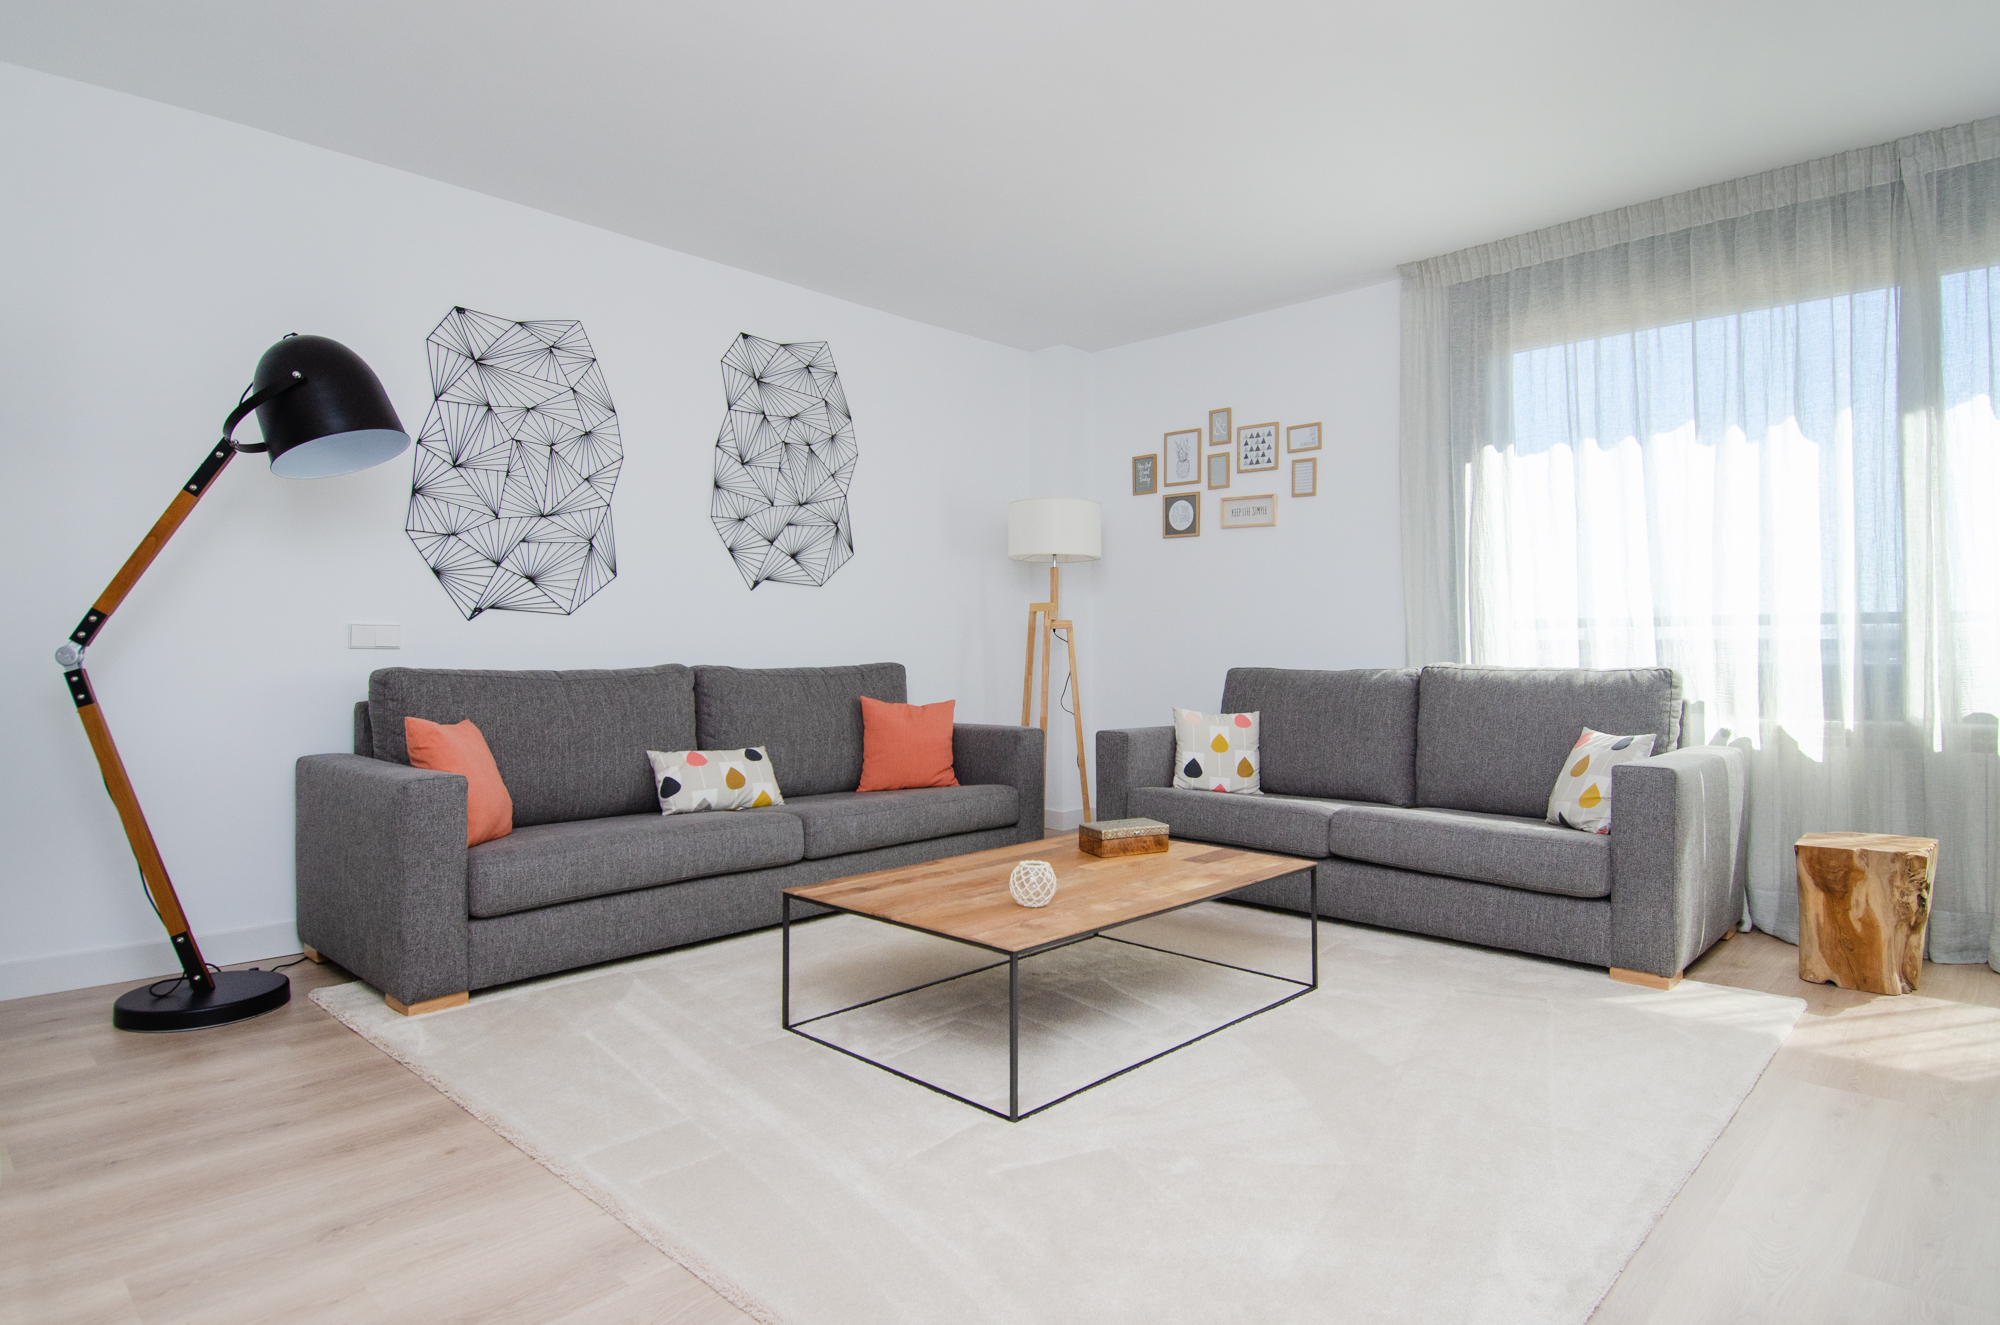 interiorismo-decoracion-ana-de-cabo-reforma-piso-santa-eugenia (11)